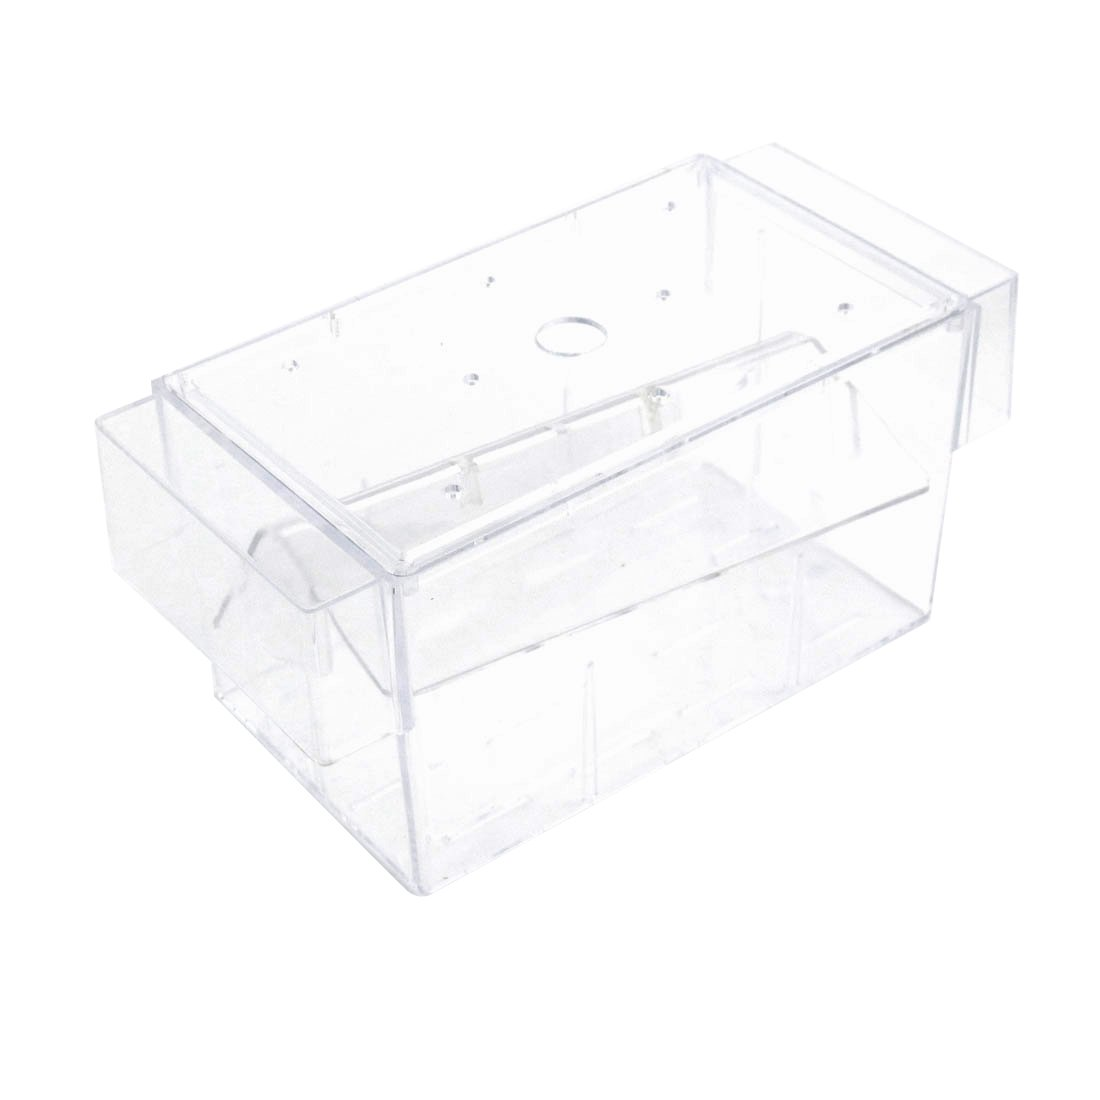 Uxcell Plastic Fish Tank Fry Net Breeder Hatchery, Clear a13071700ux0304